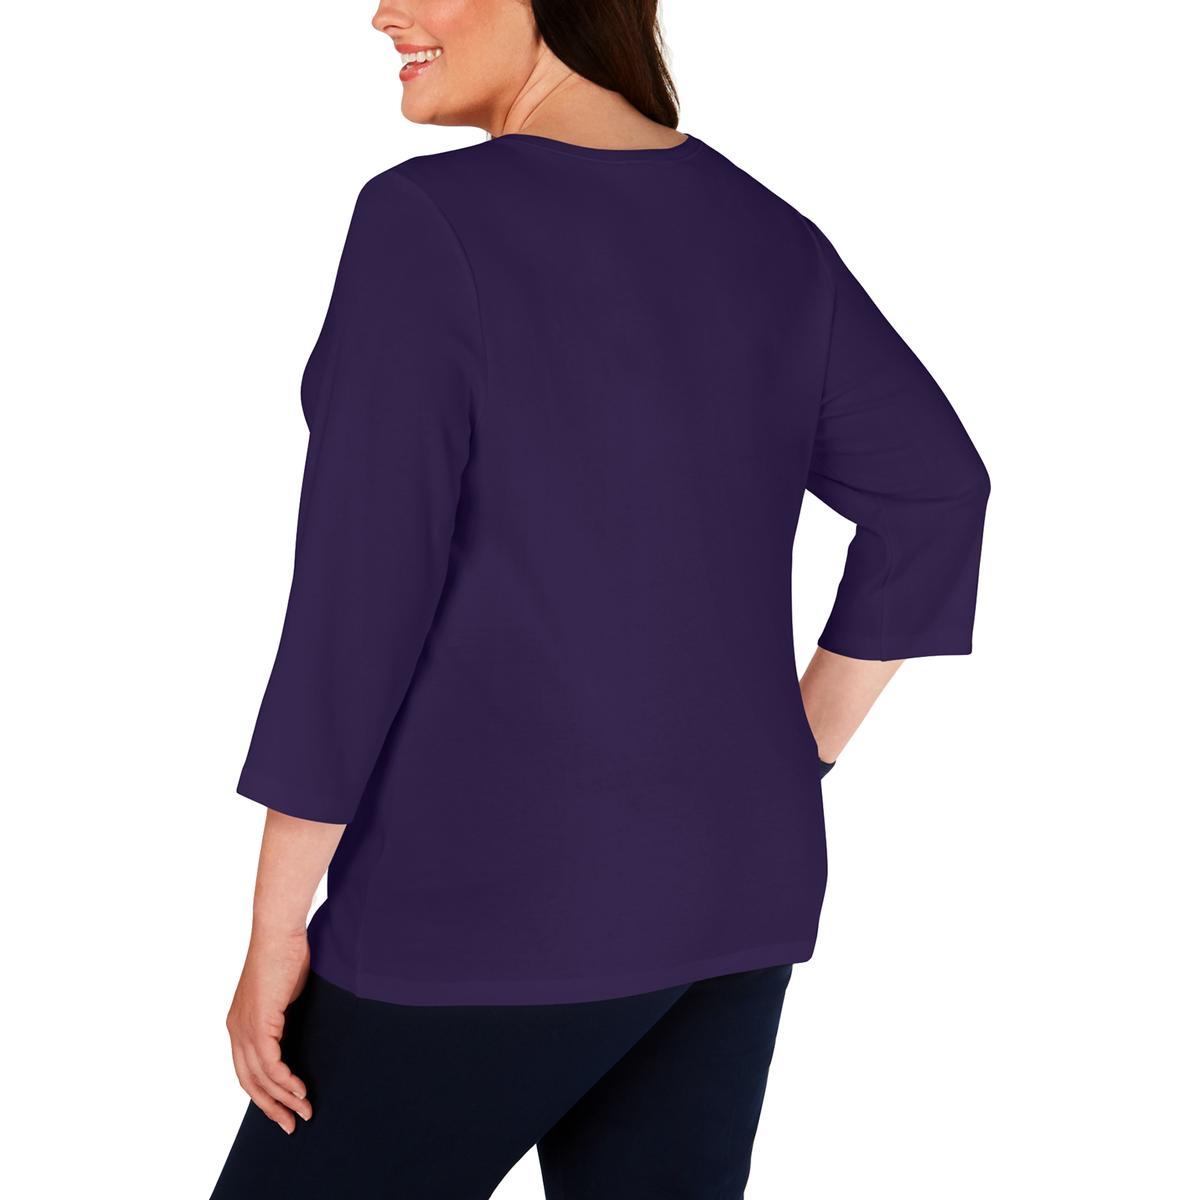 Karen Scott Womens Heathered V-Neck Tee Henley Top Shirt Plus BHFO 6239